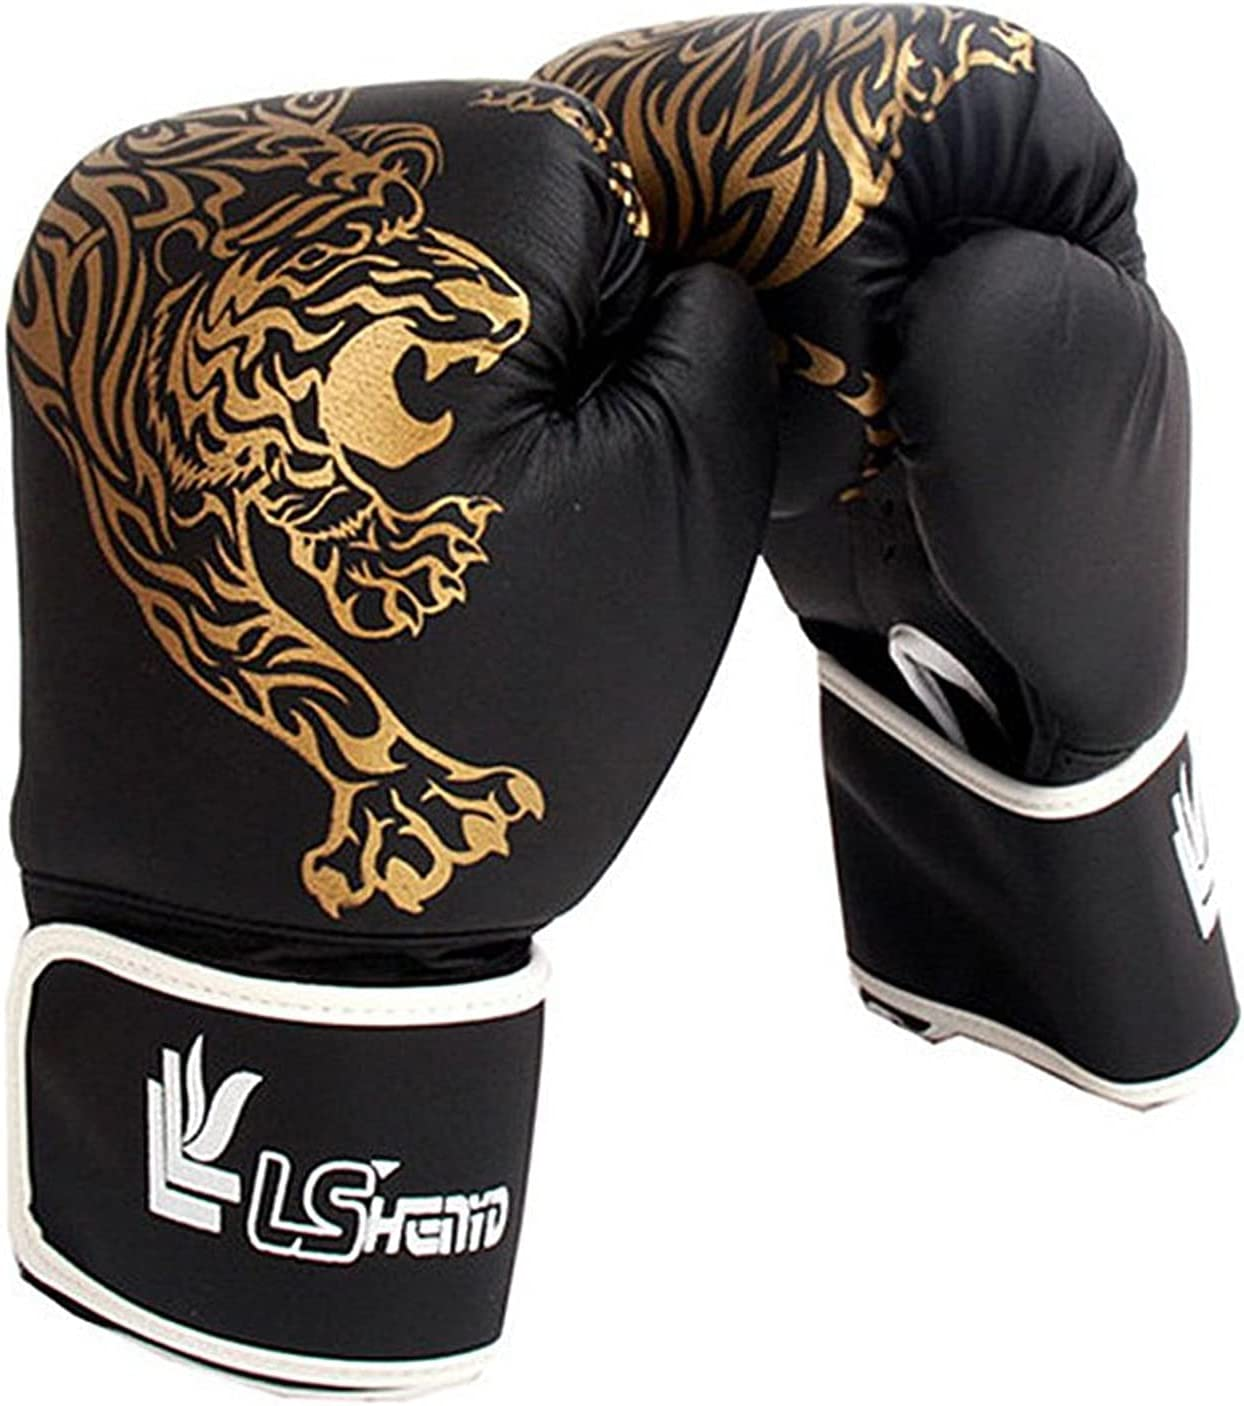 JINSHANDIANLIAO Kick Boxing Gloves PU D Max 45% 40% OFF Cheap Sale OFF Karate Thai Muay Guantes